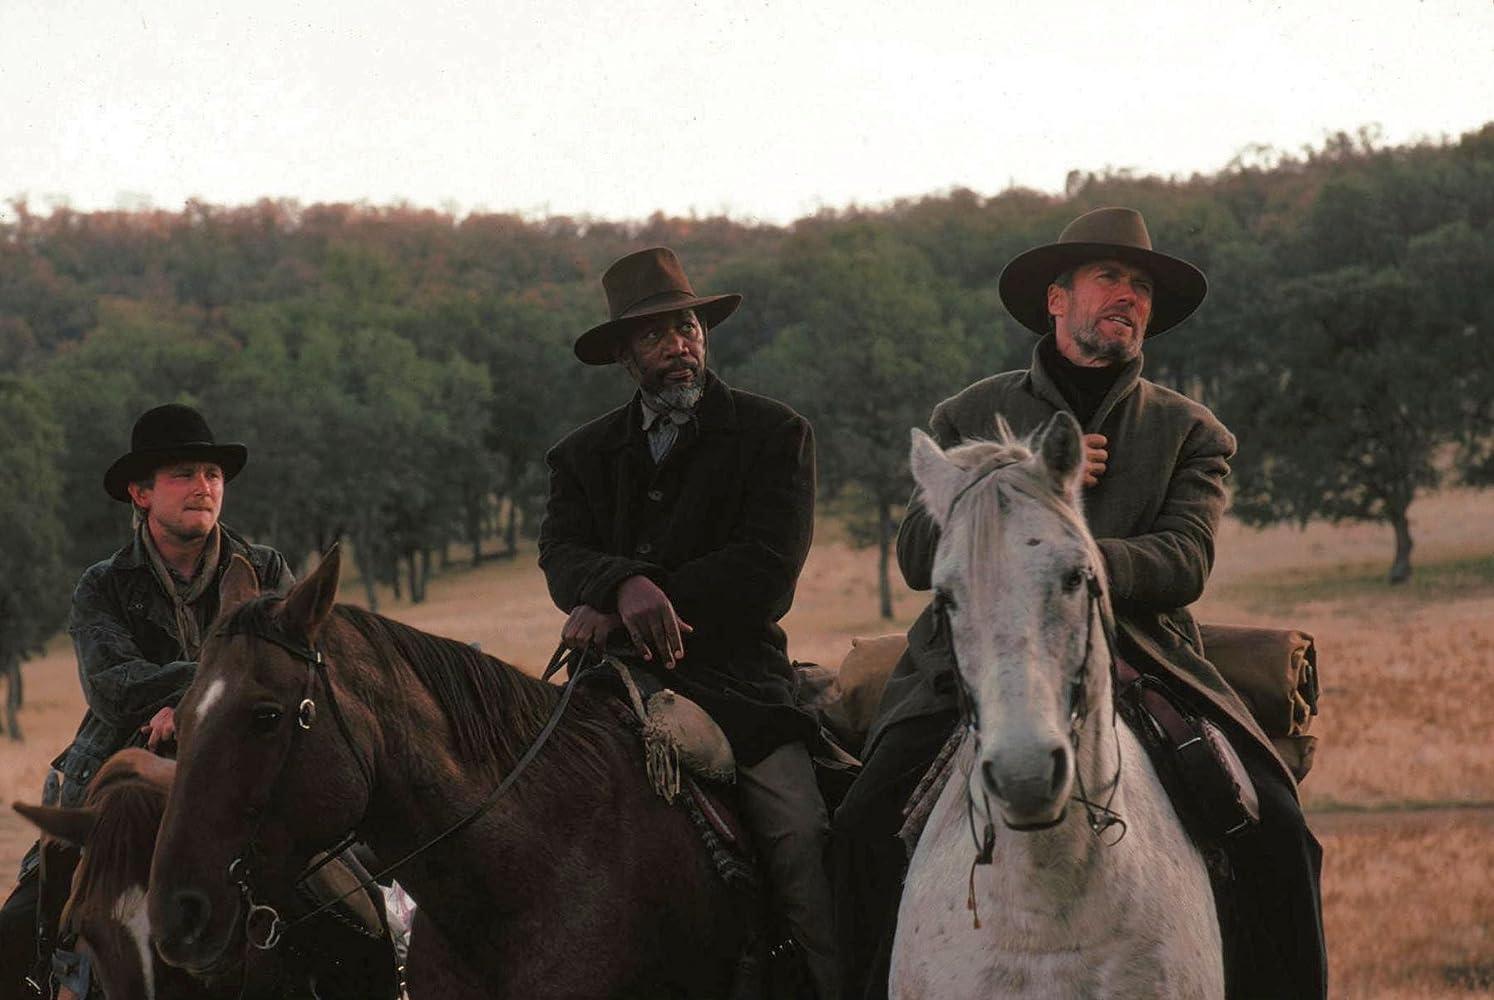 Clint Eastwood, Morgan Freeman, and Jaimz Woolvett in Unforgiven (1992)